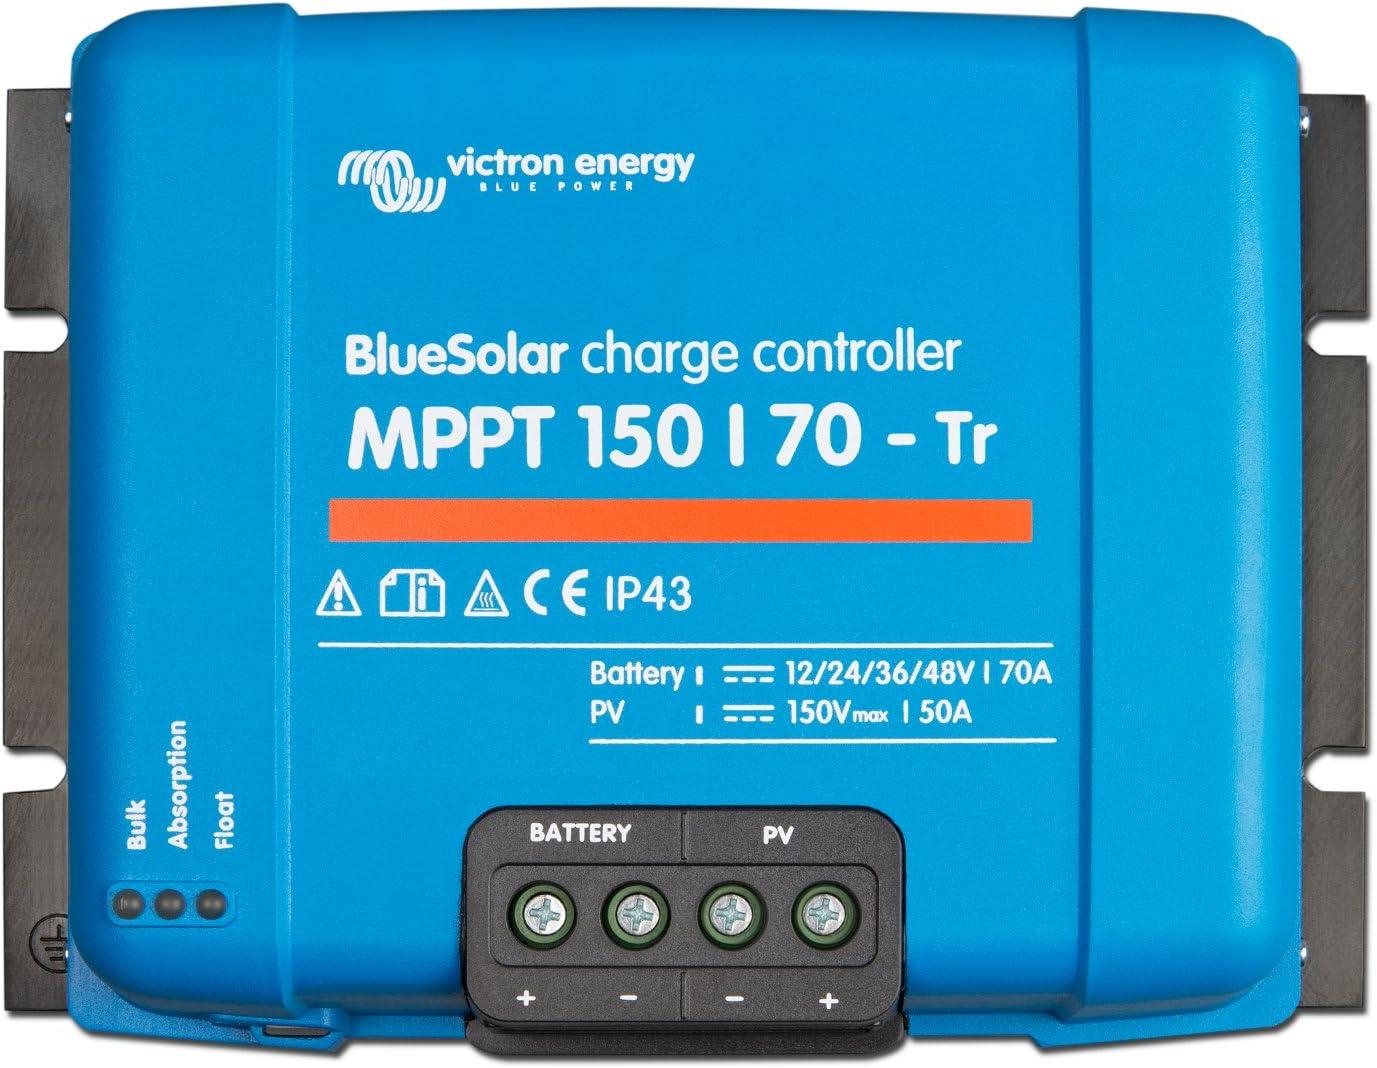 Victron BlueSolar MPPT 150/70 70A - Controlador de carga solar para paneles solares (hasta 1000 W (12 V), 2000 W (24 V), 3000 W (36 V), 4000 W (48 V) y hasta 150 V)